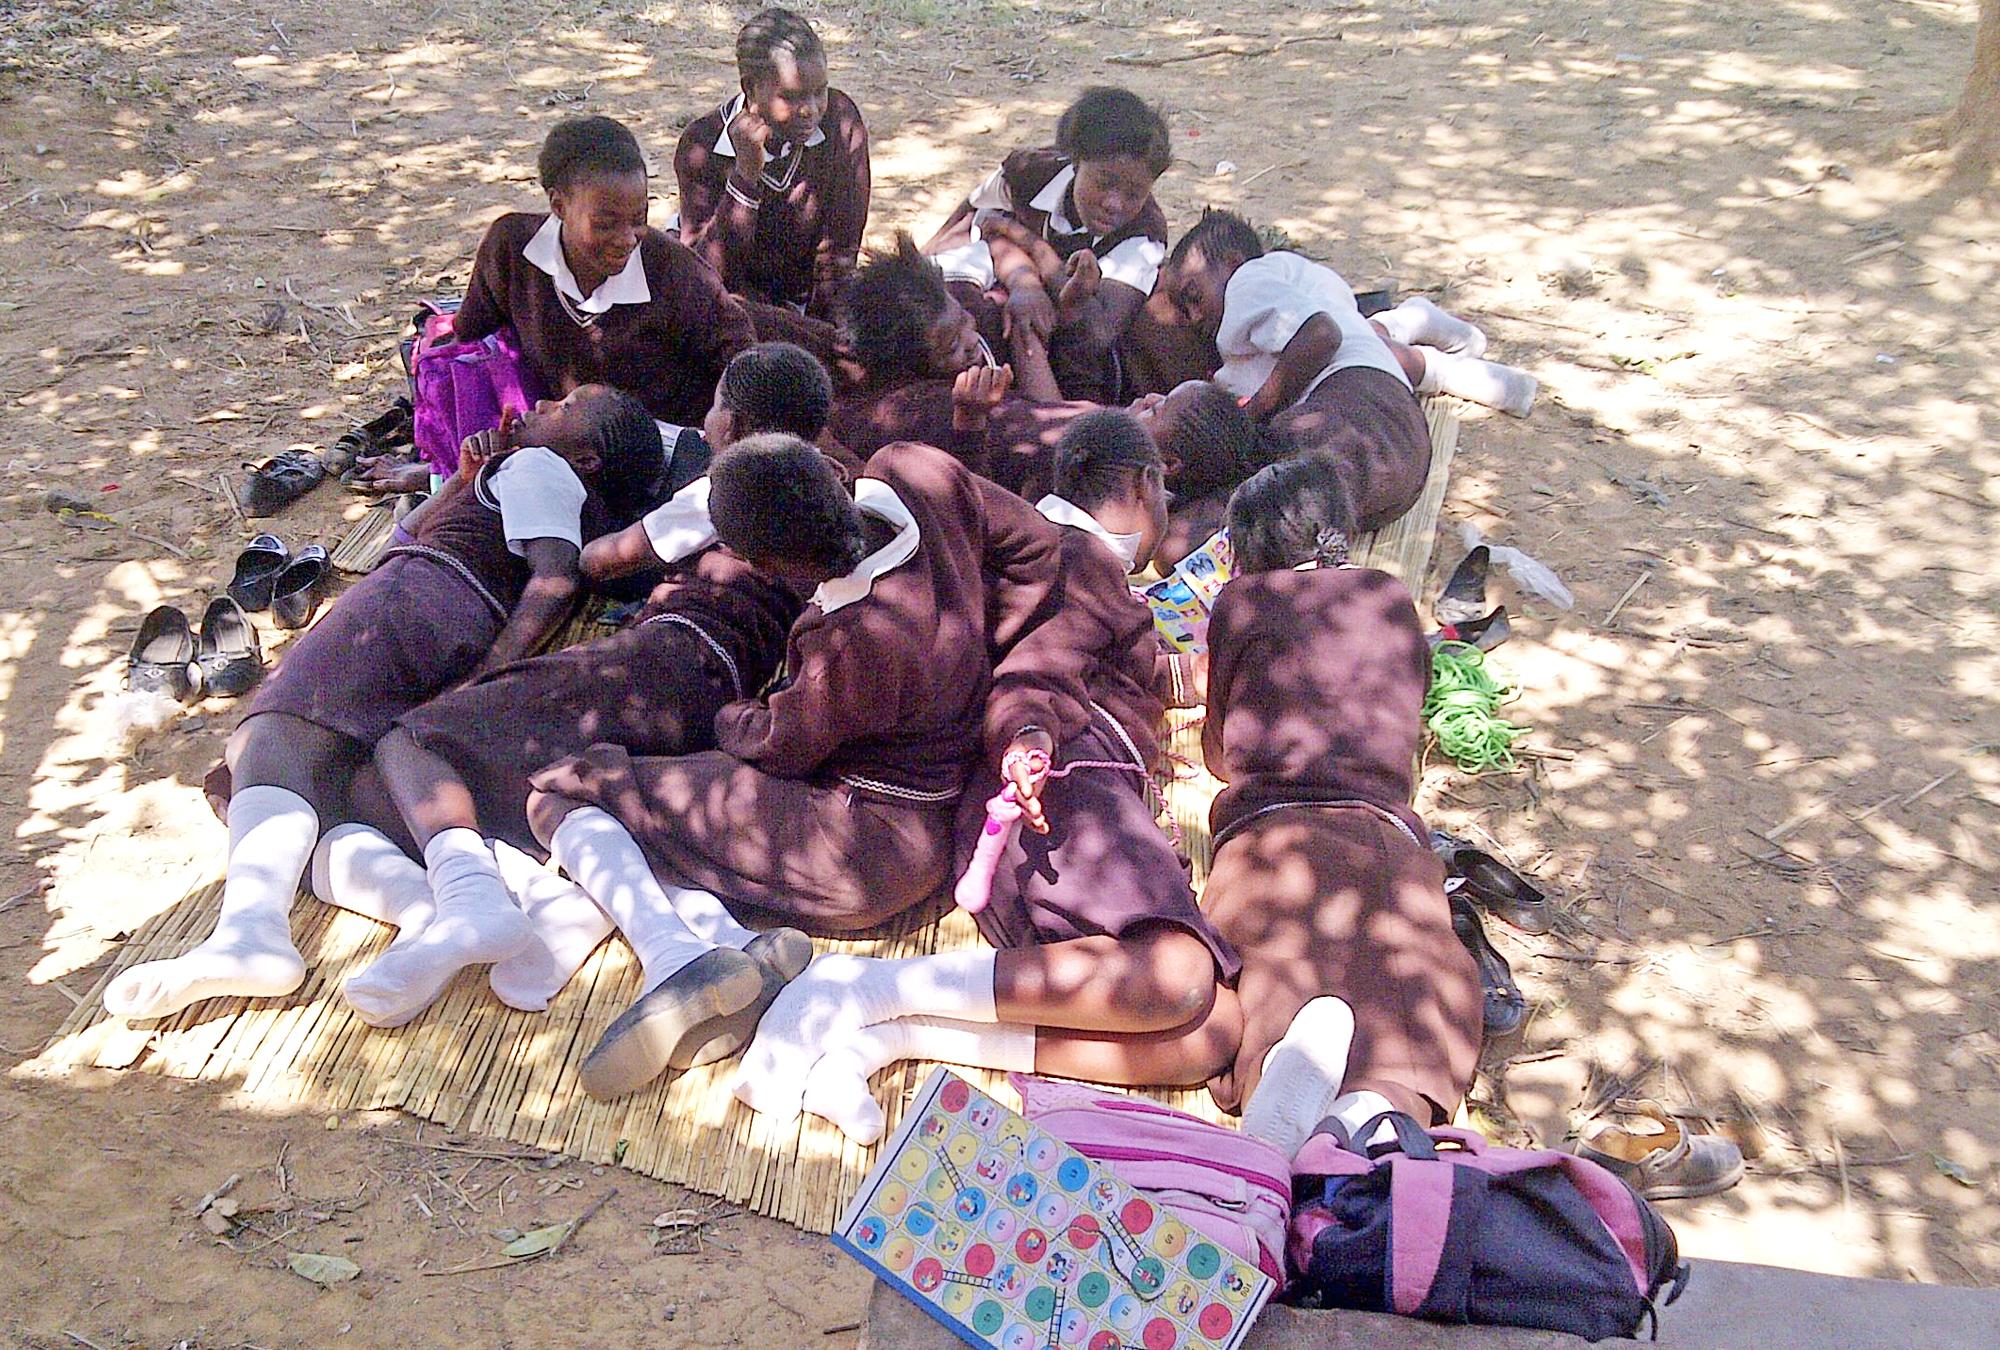 Girls in uniforms lounge outside on mat